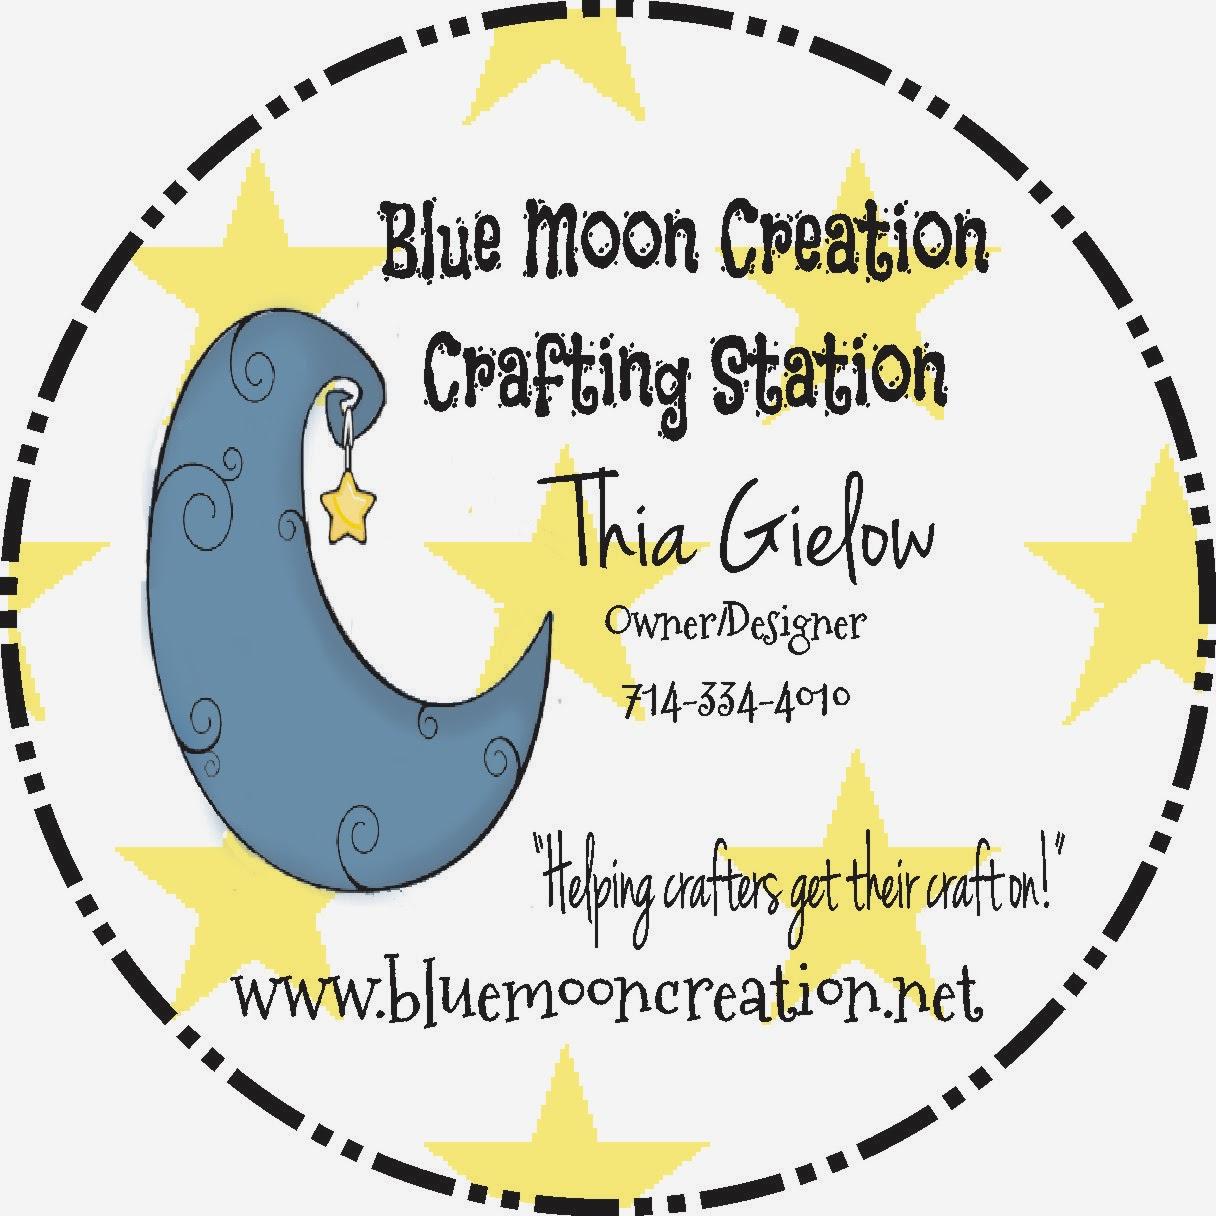 Blue Moon Creaton